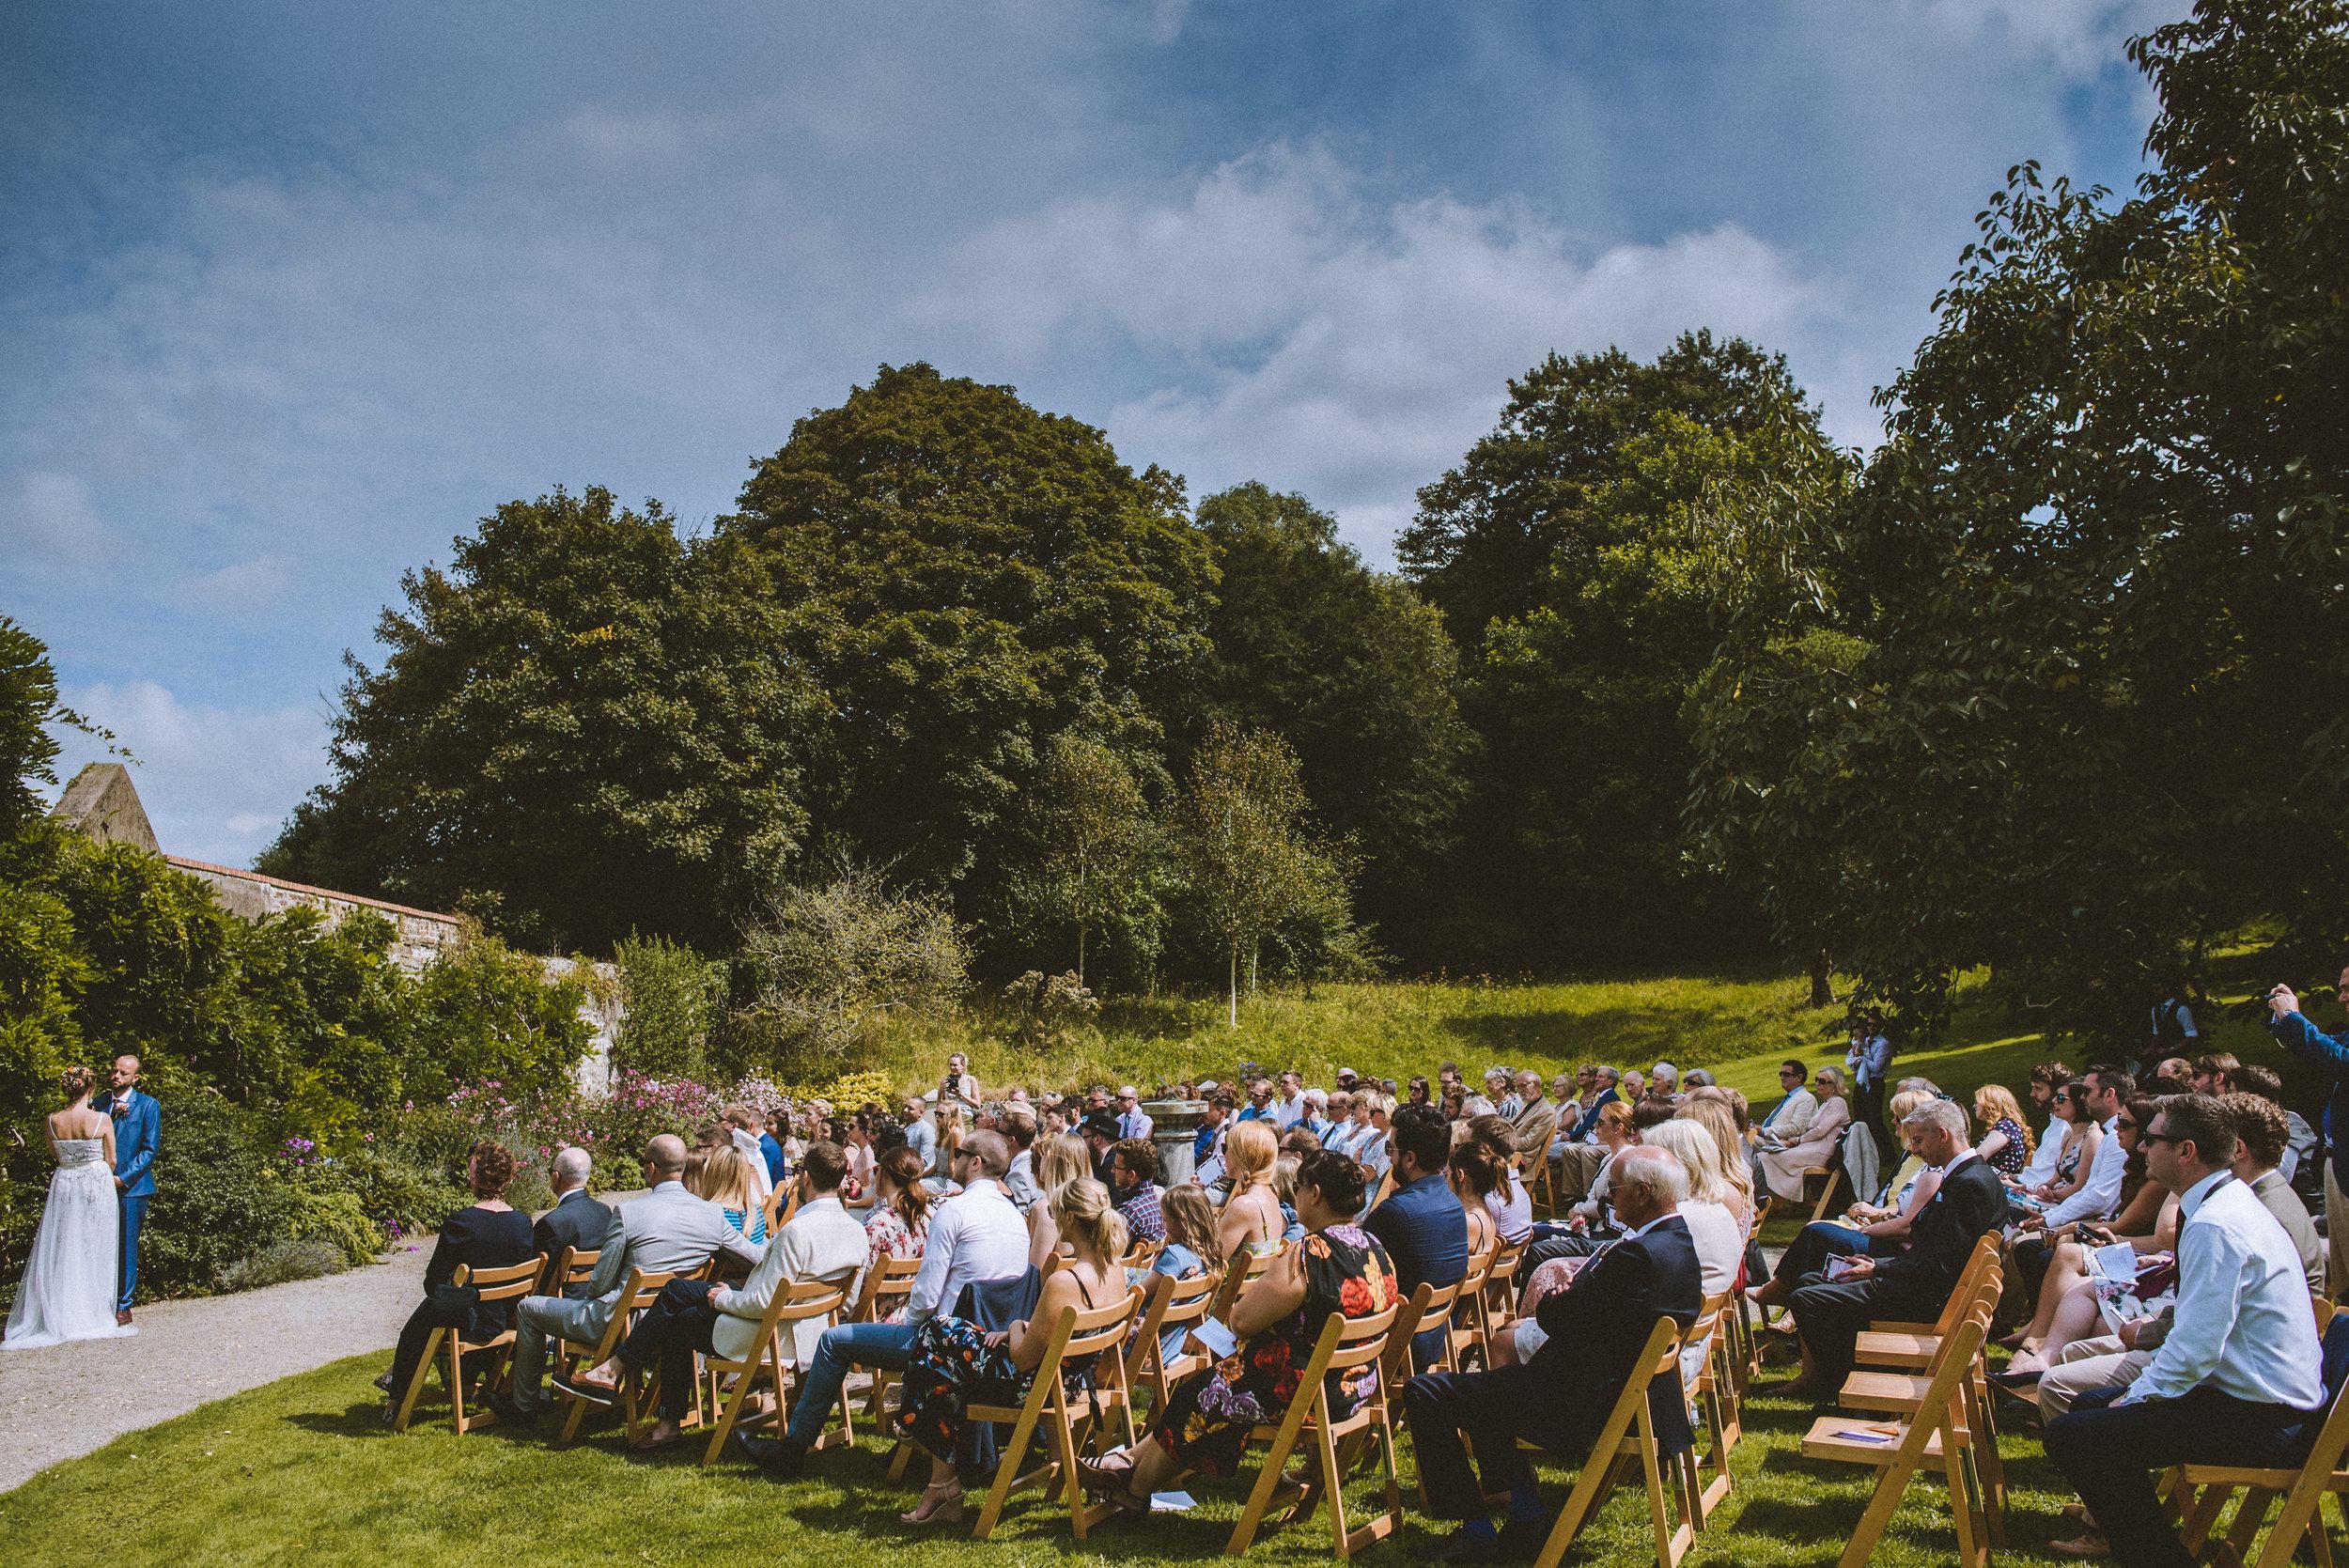 pencarrow-house-wedding-photographer-56.jpg